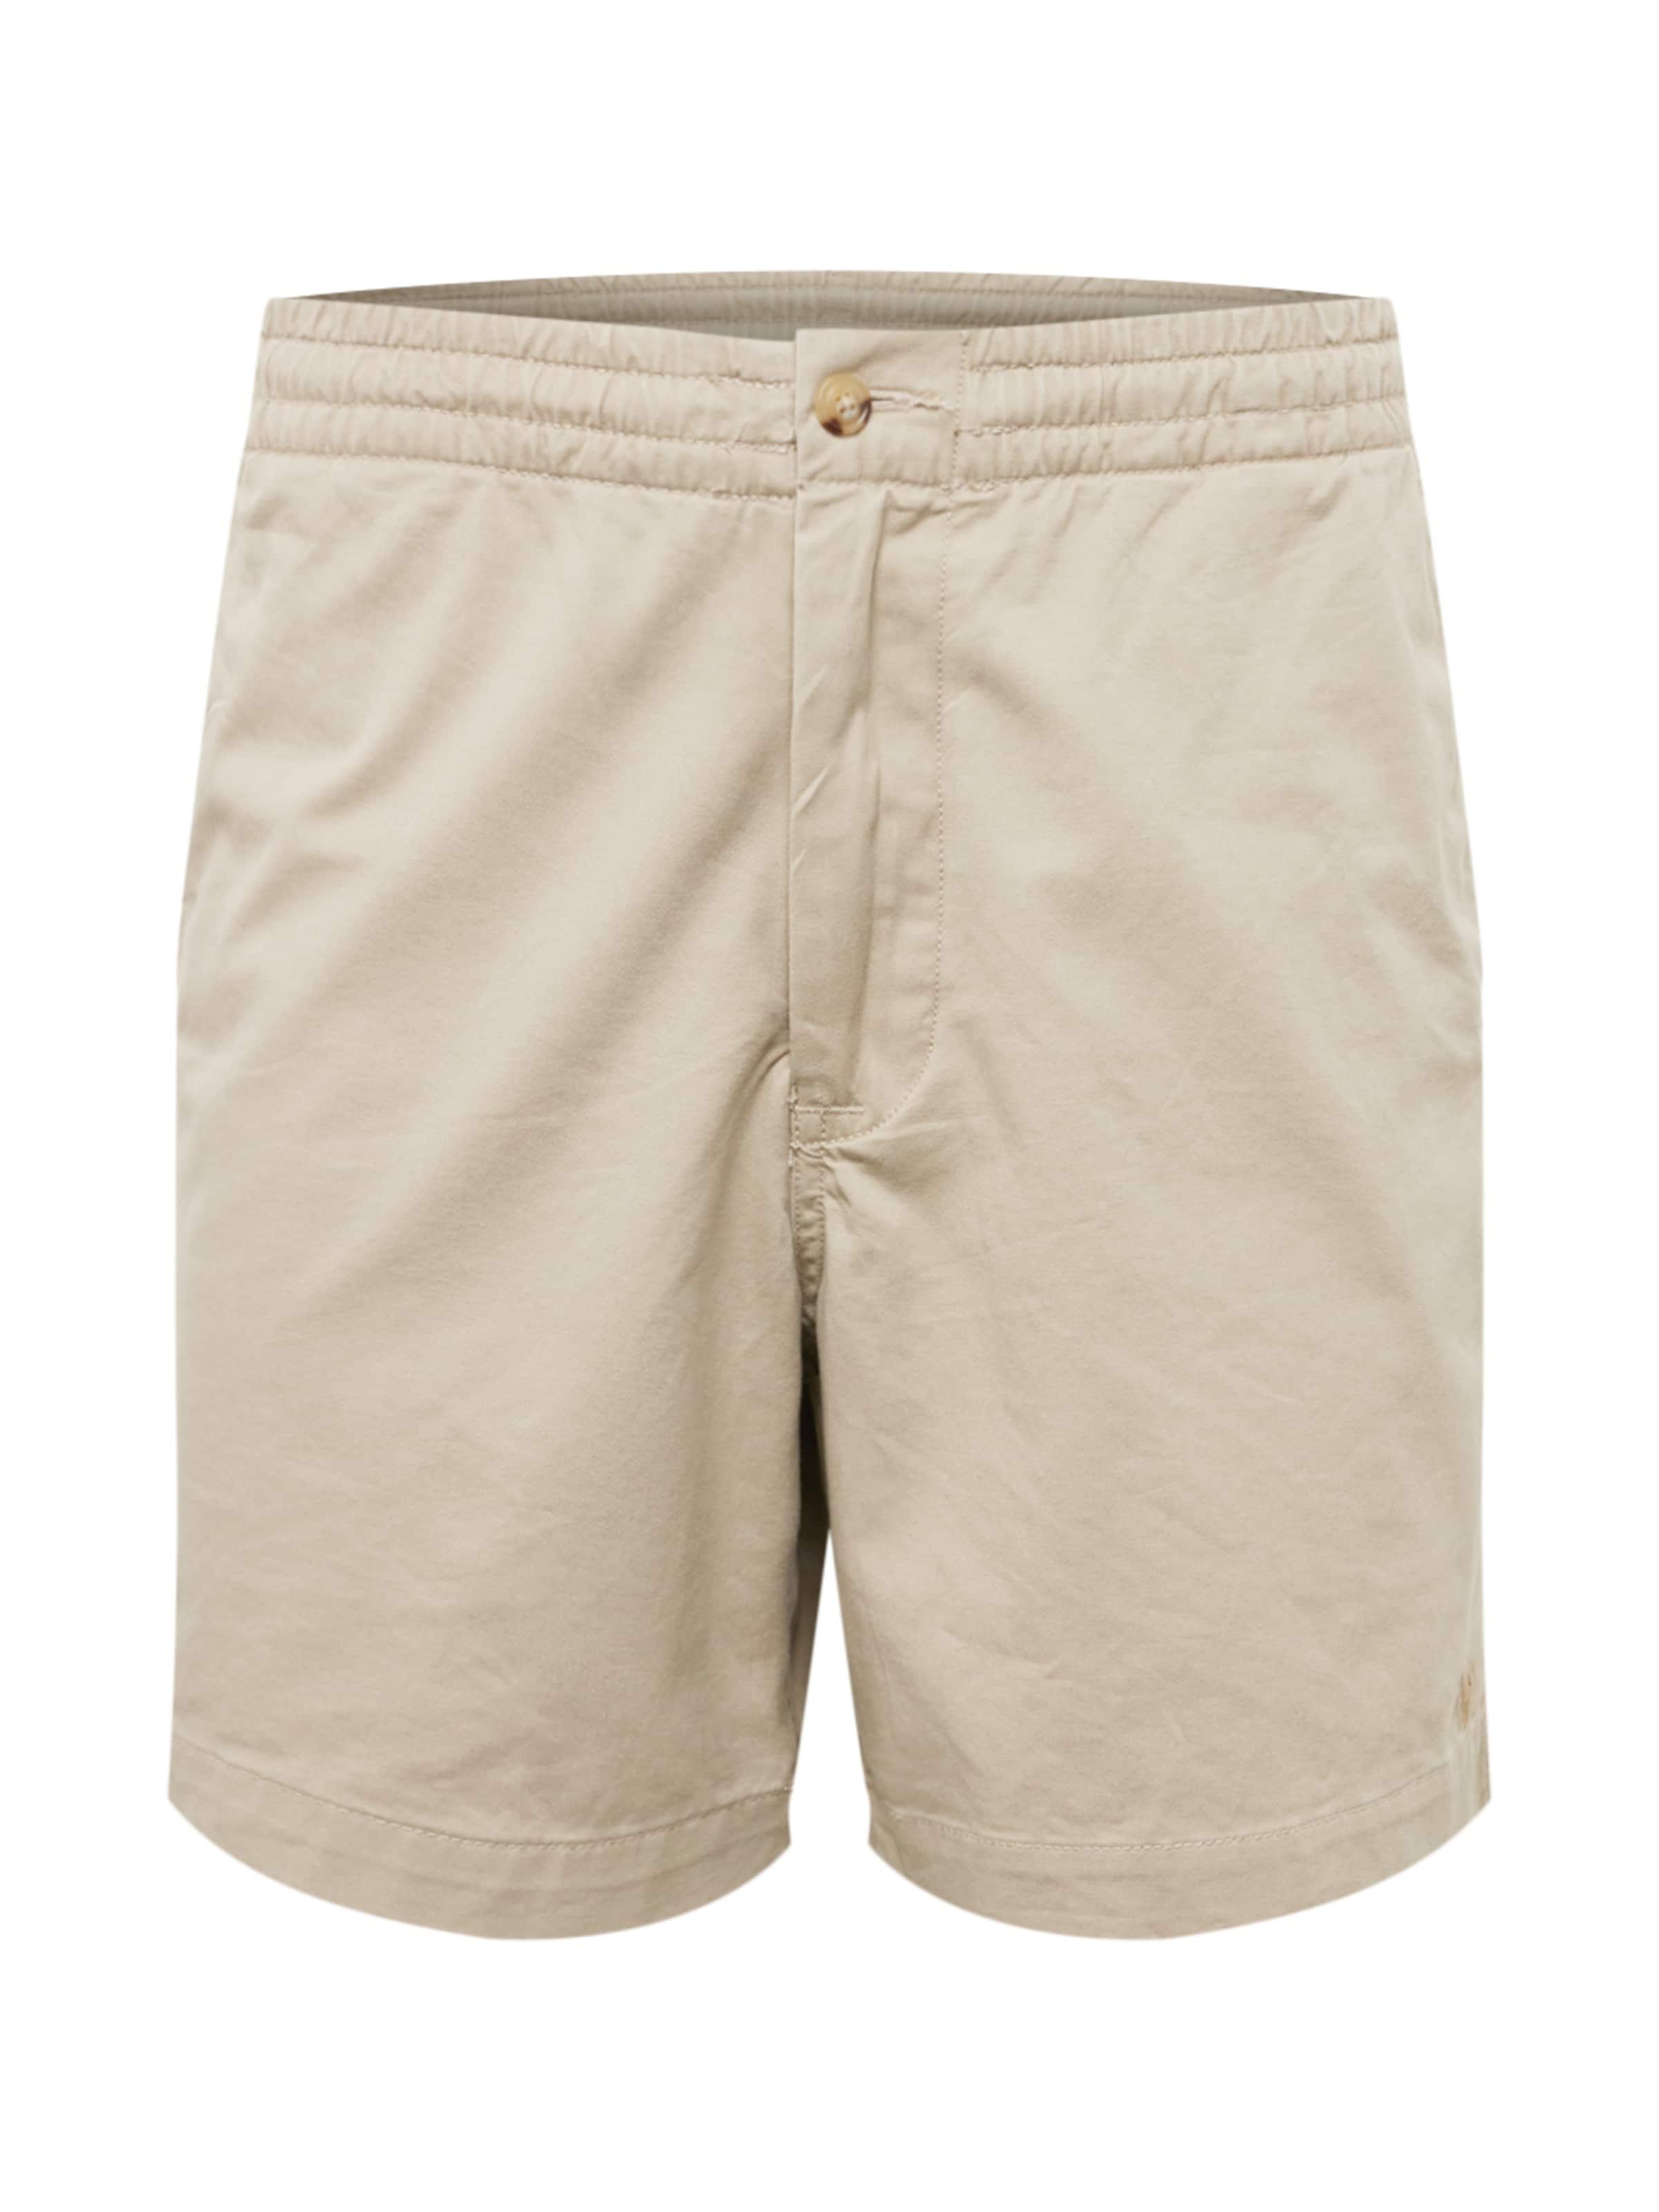 short' Polo Shorts flat Lauren In Ralph Beige 'cfprepsters W2IYEDH9